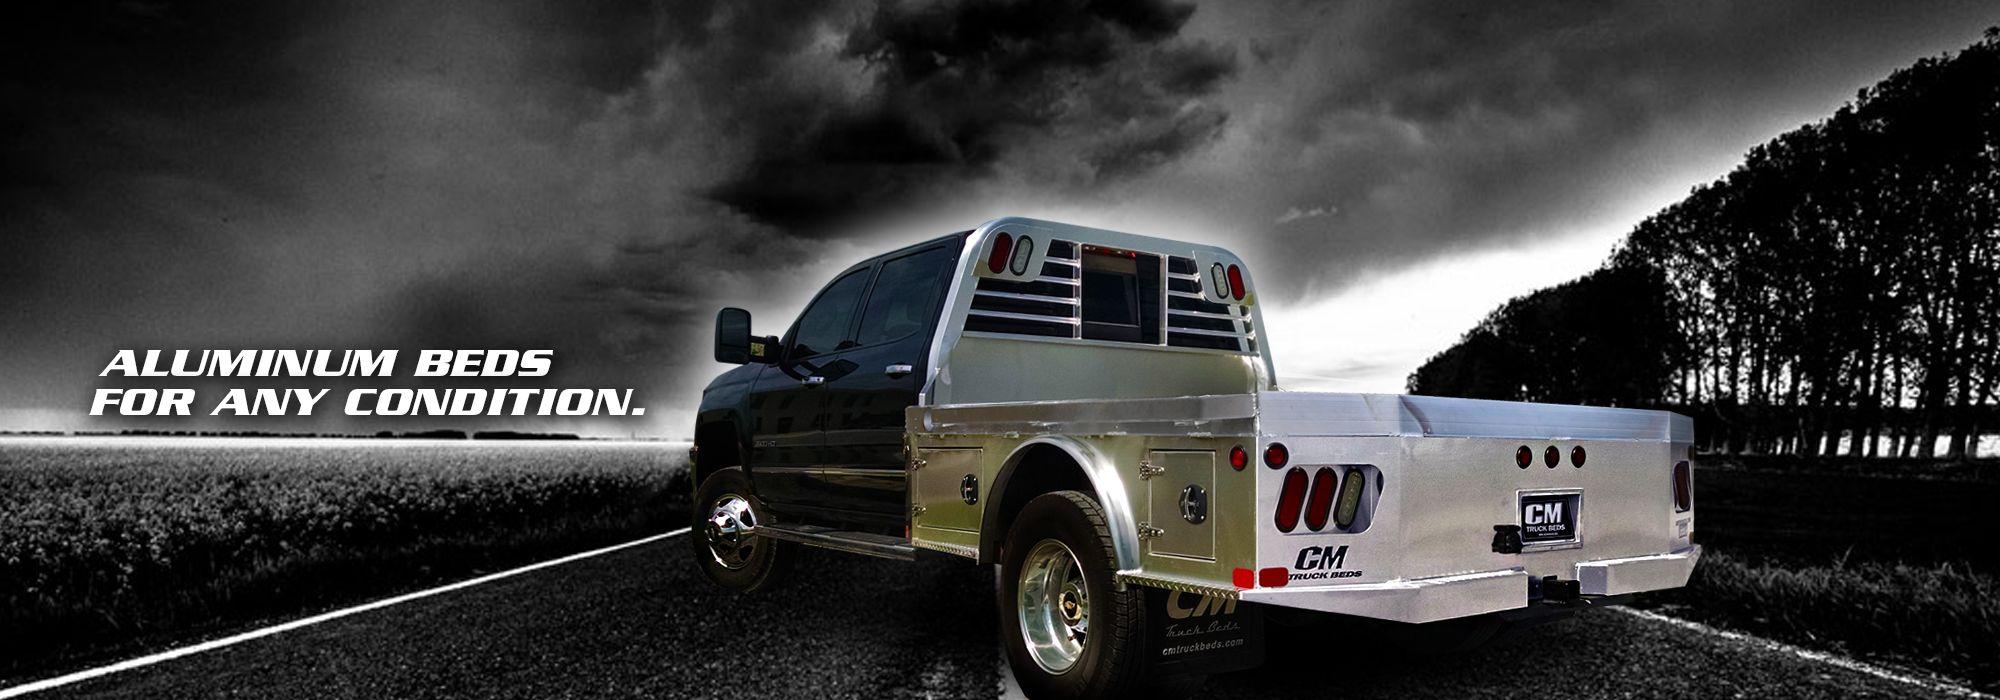 sk aluminum bedMidwest motorseureka mo Cars trucks